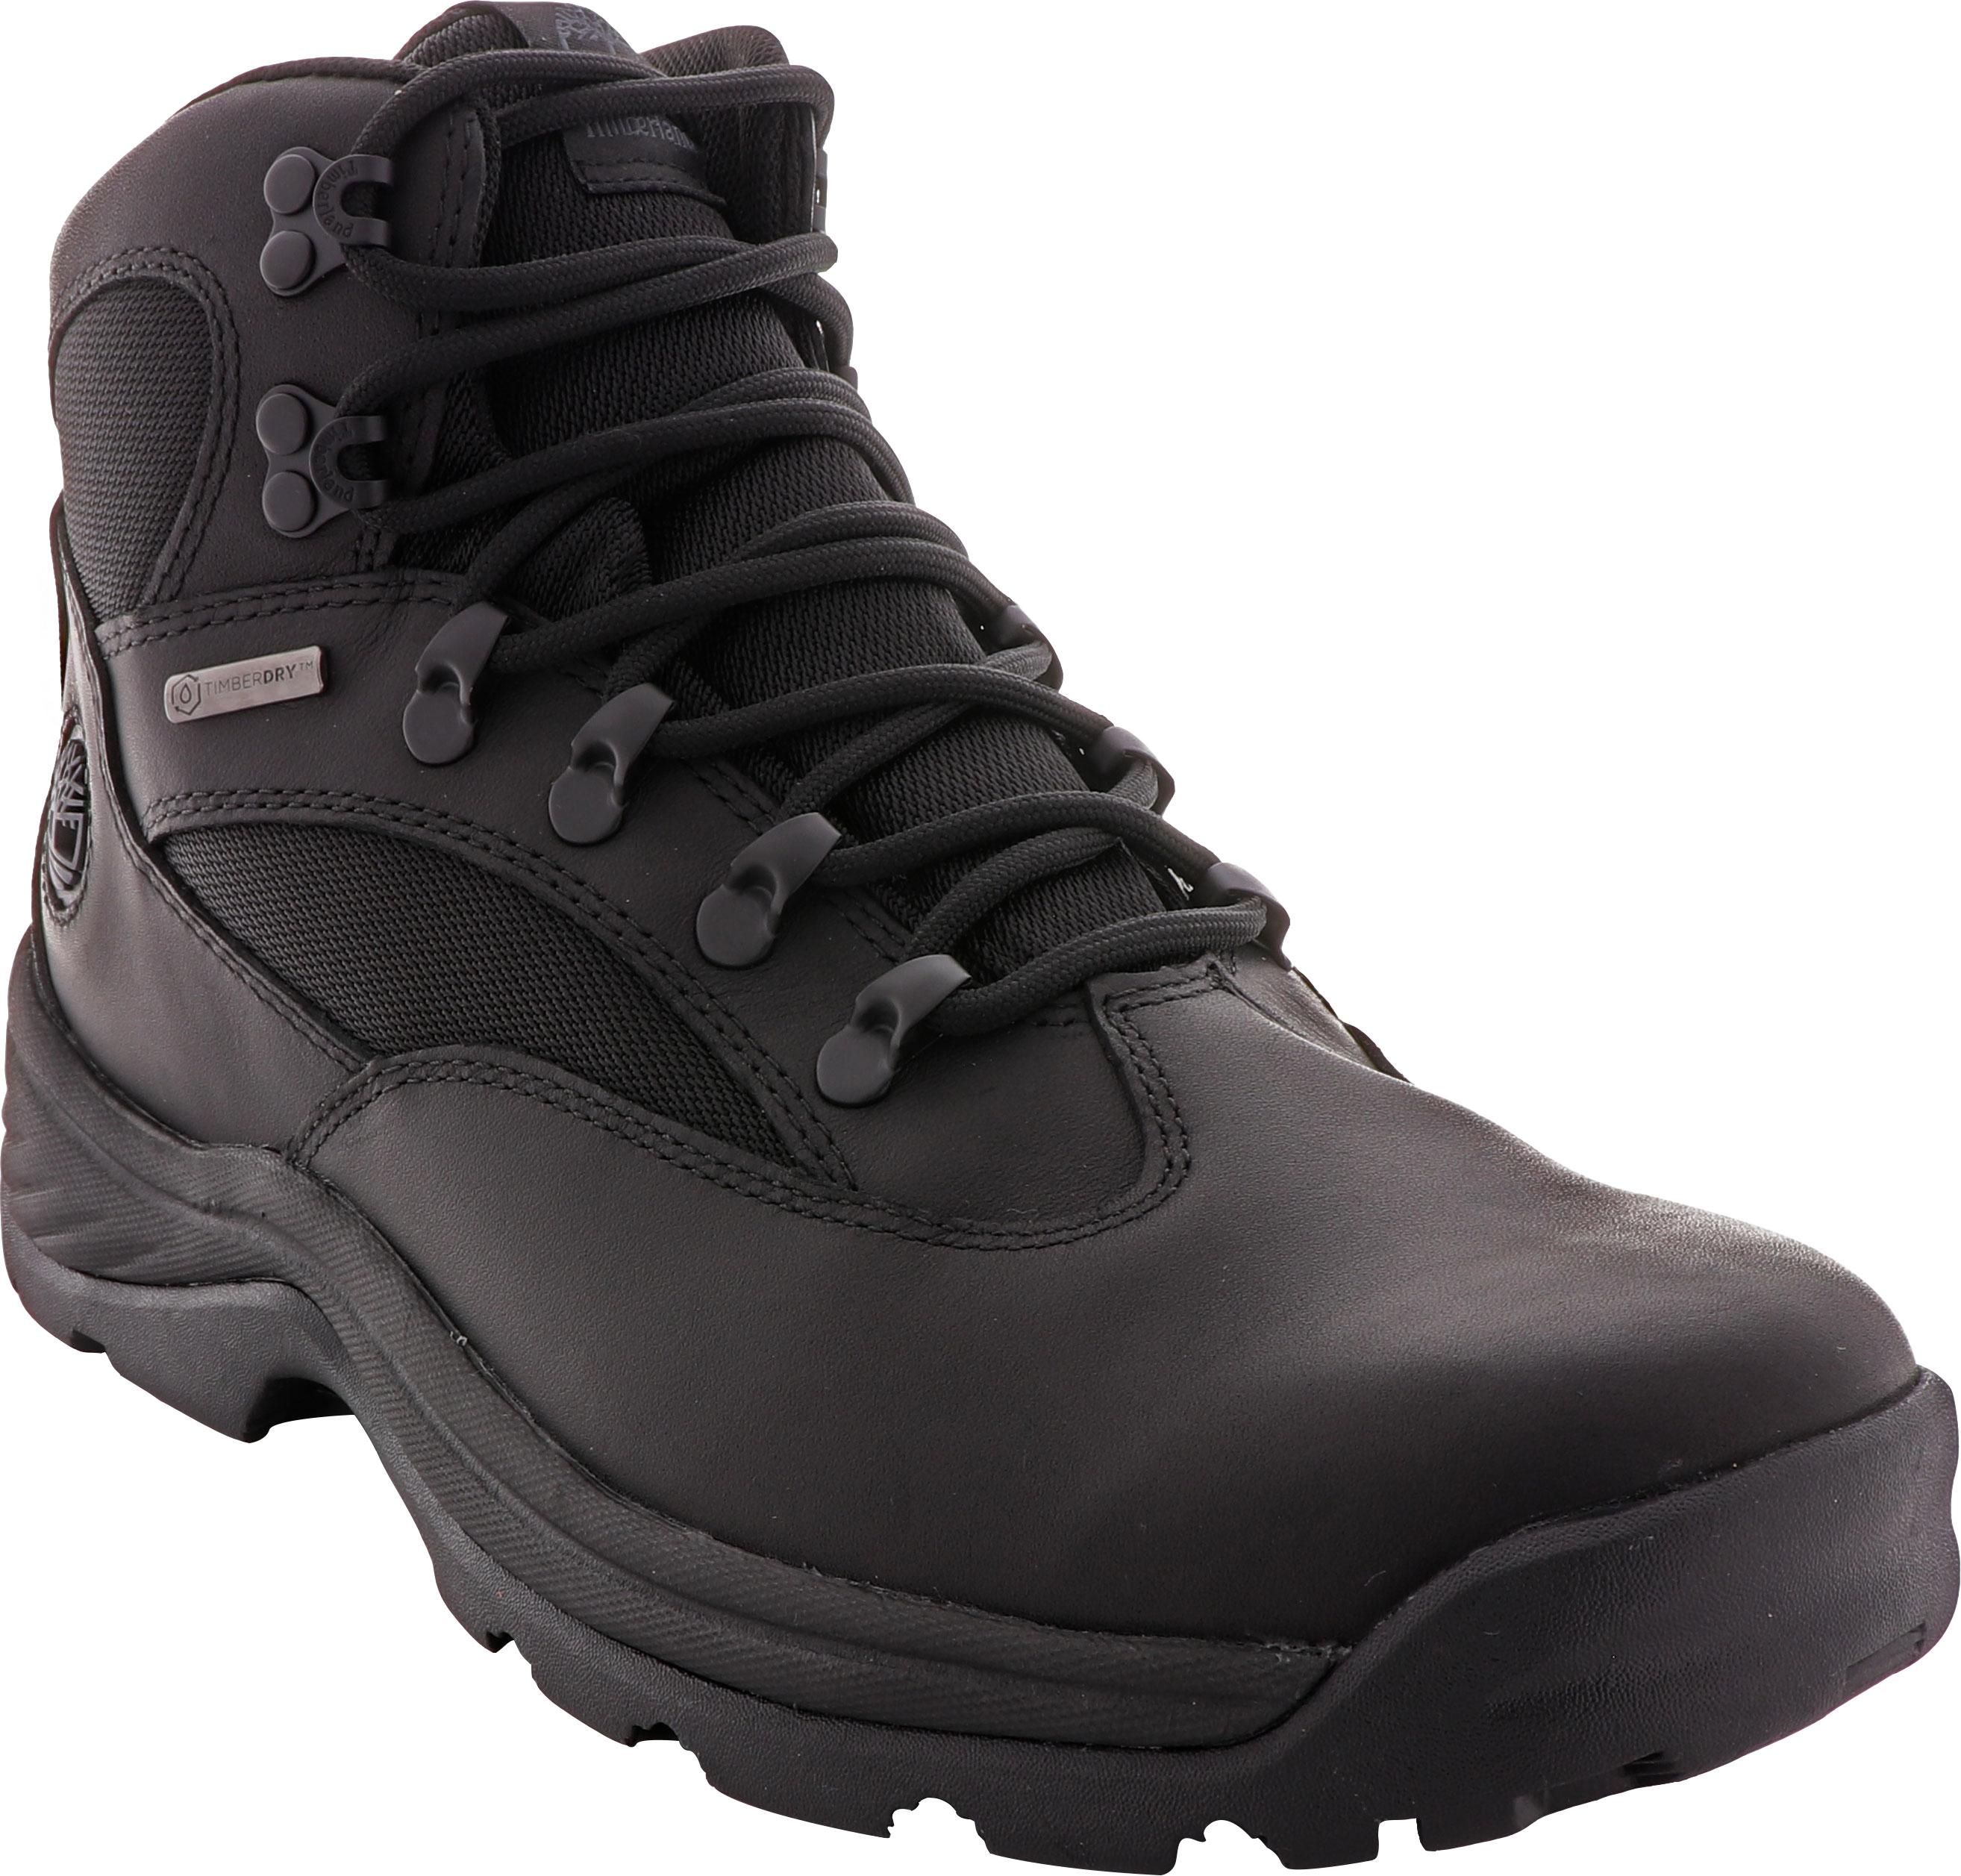 Timberland Men s TB018193001 - Chocorua Trail Mid - The Shoe Mart e86ab9a1663